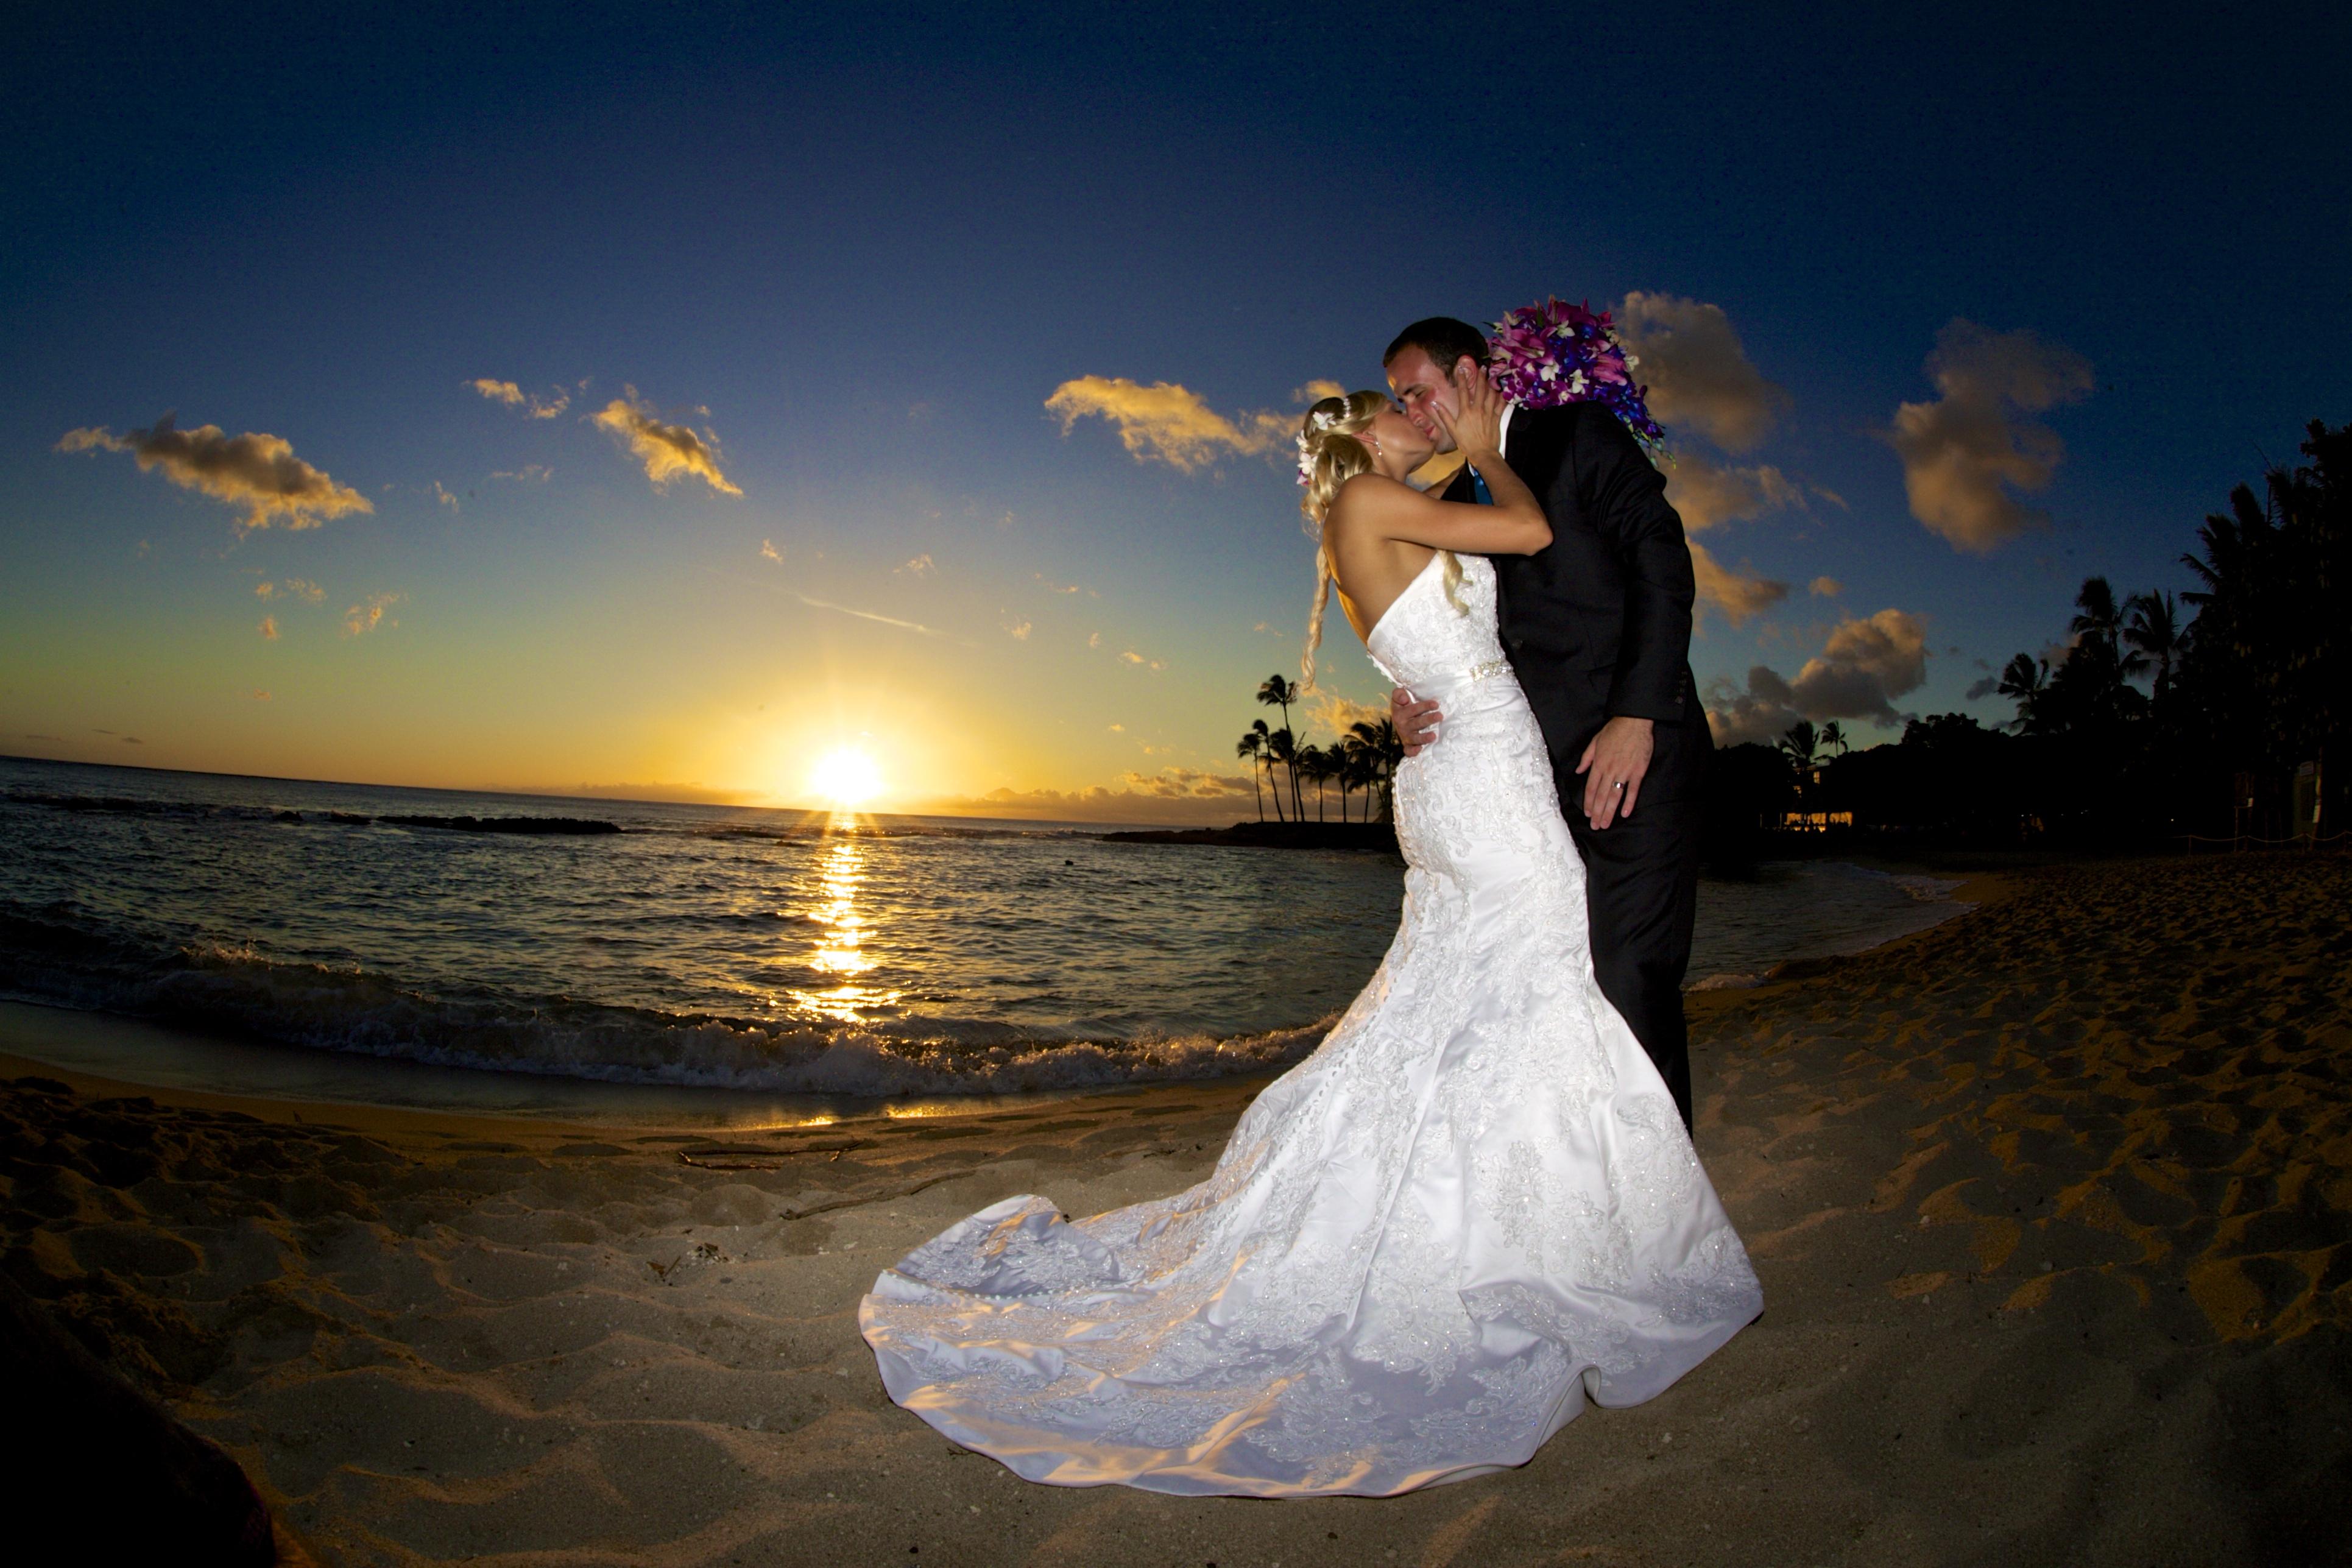 Sunset wedding photos in Hawaii 1